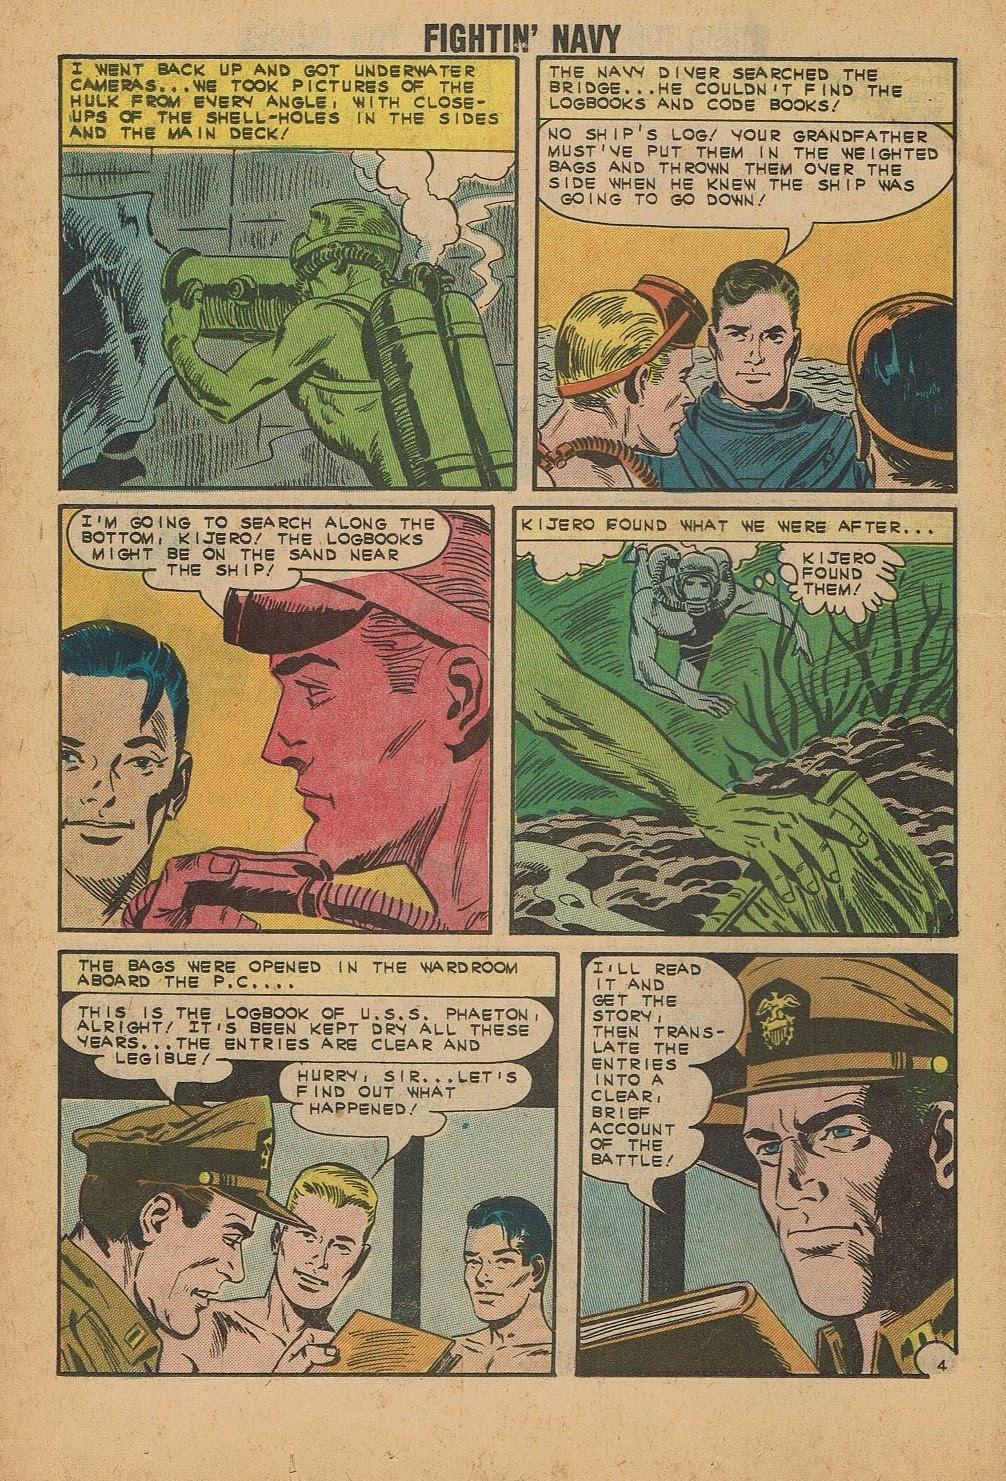 Read online Fightin' Navy comic -  Issue #112 - 18